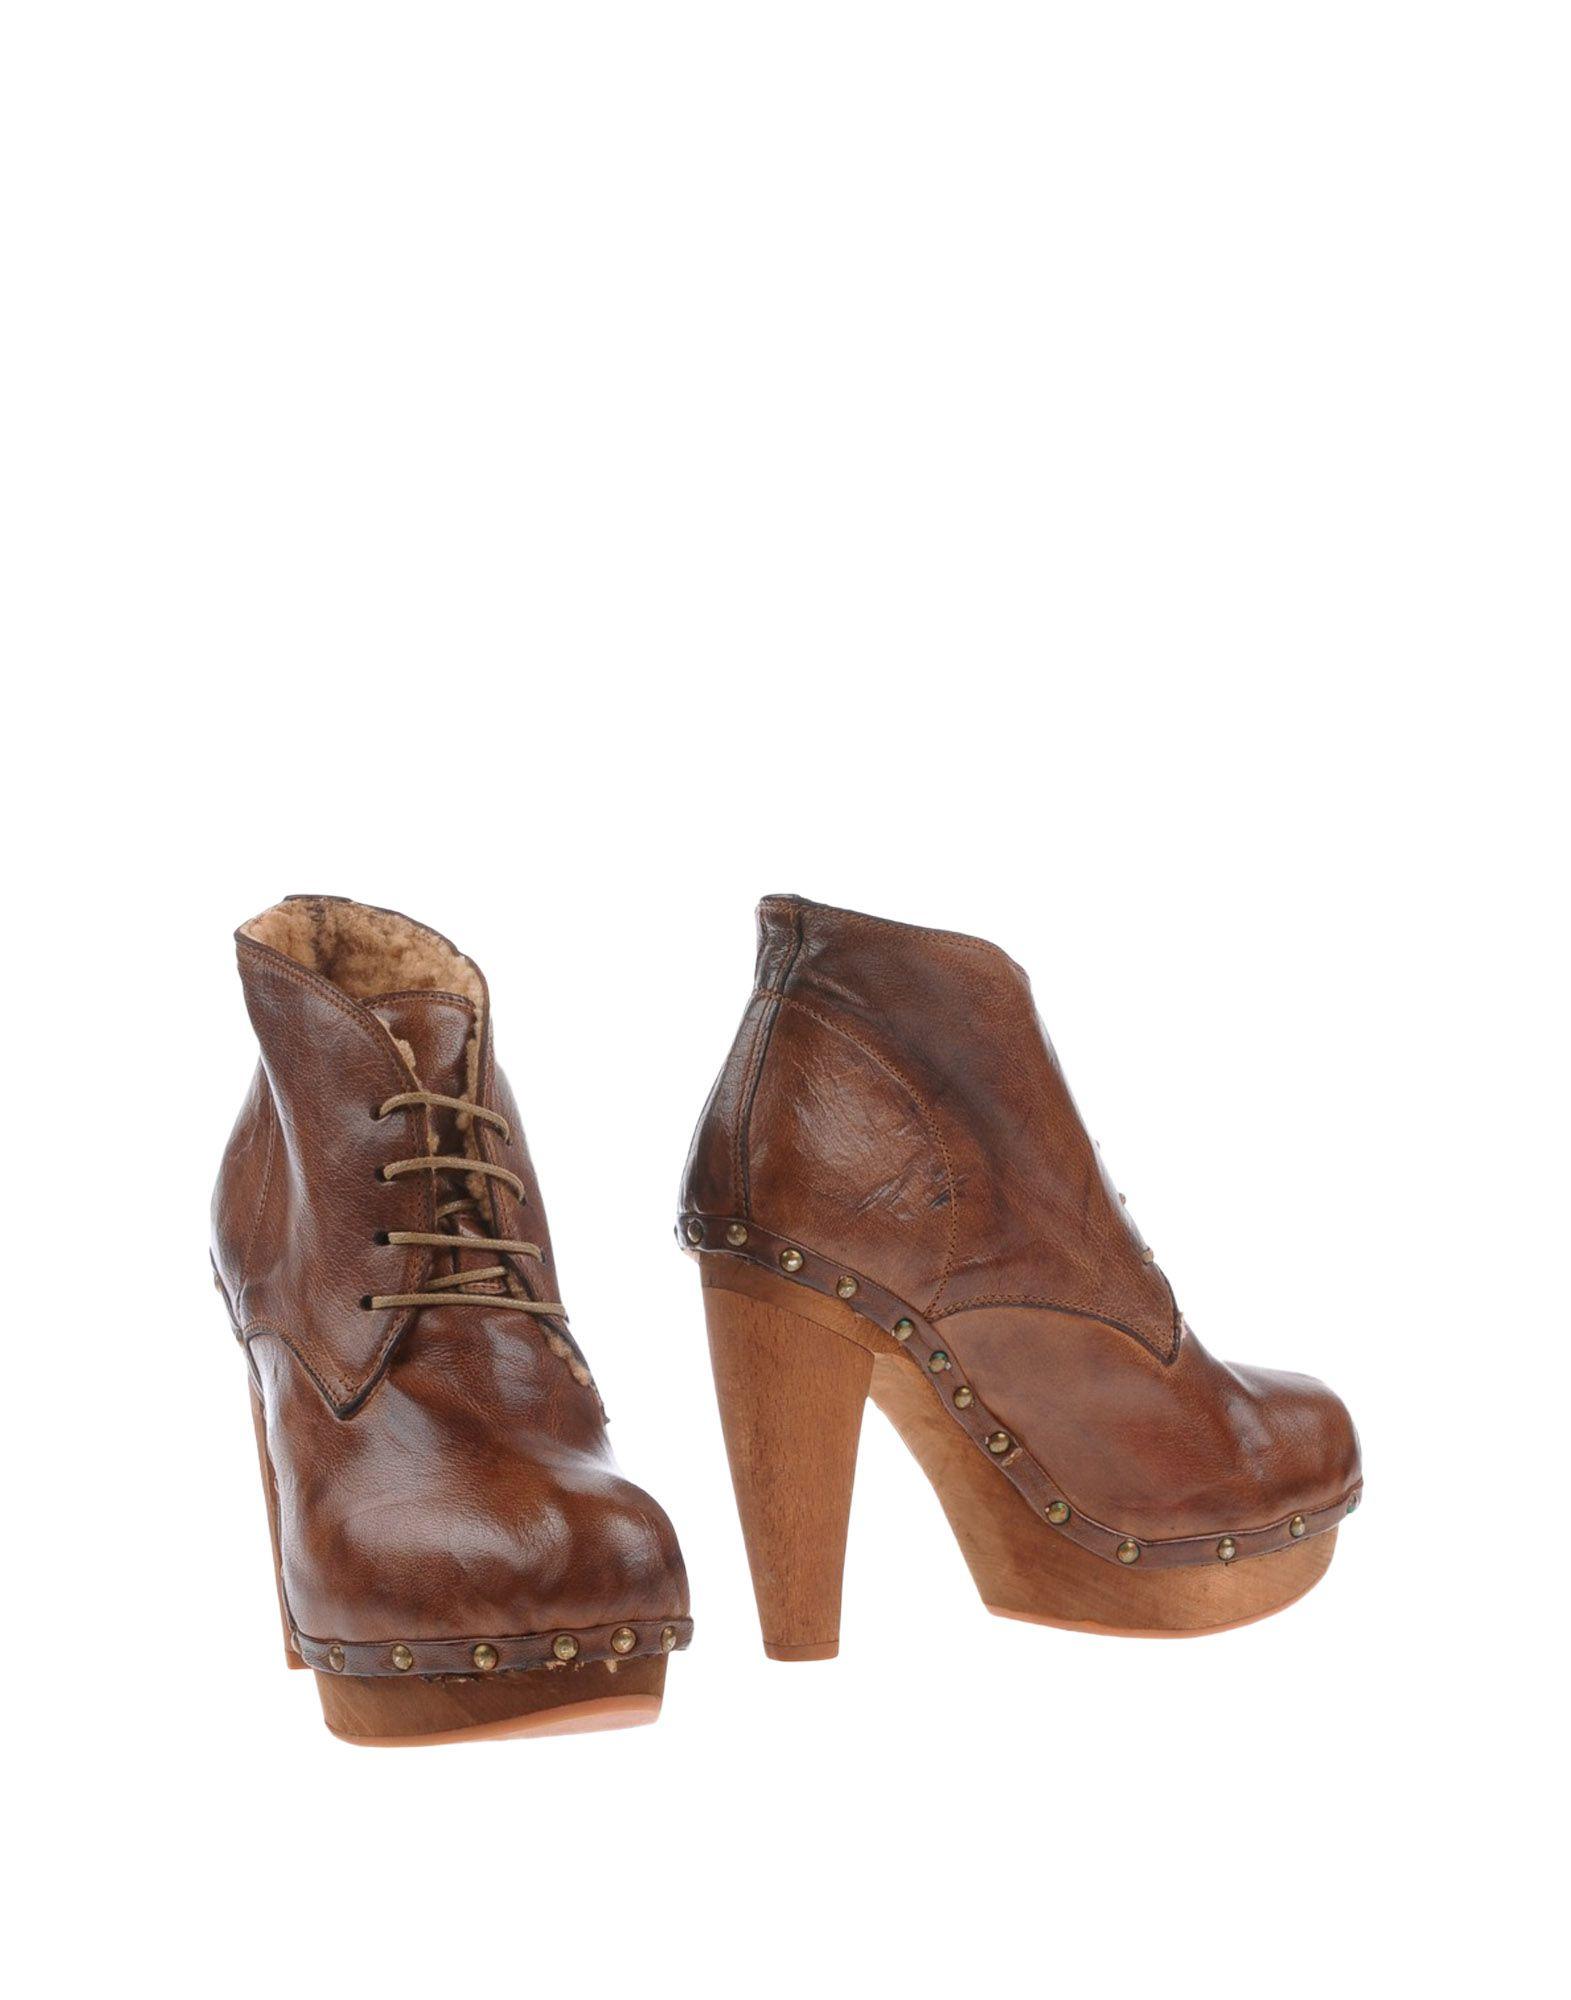 Fauzian Jeunesse Vintage Ankle Boot - Ankle Women Fauzian Jeunesse Vintage Ankle - Boots online on  United Kingdom - 11295459IF 15b8a4